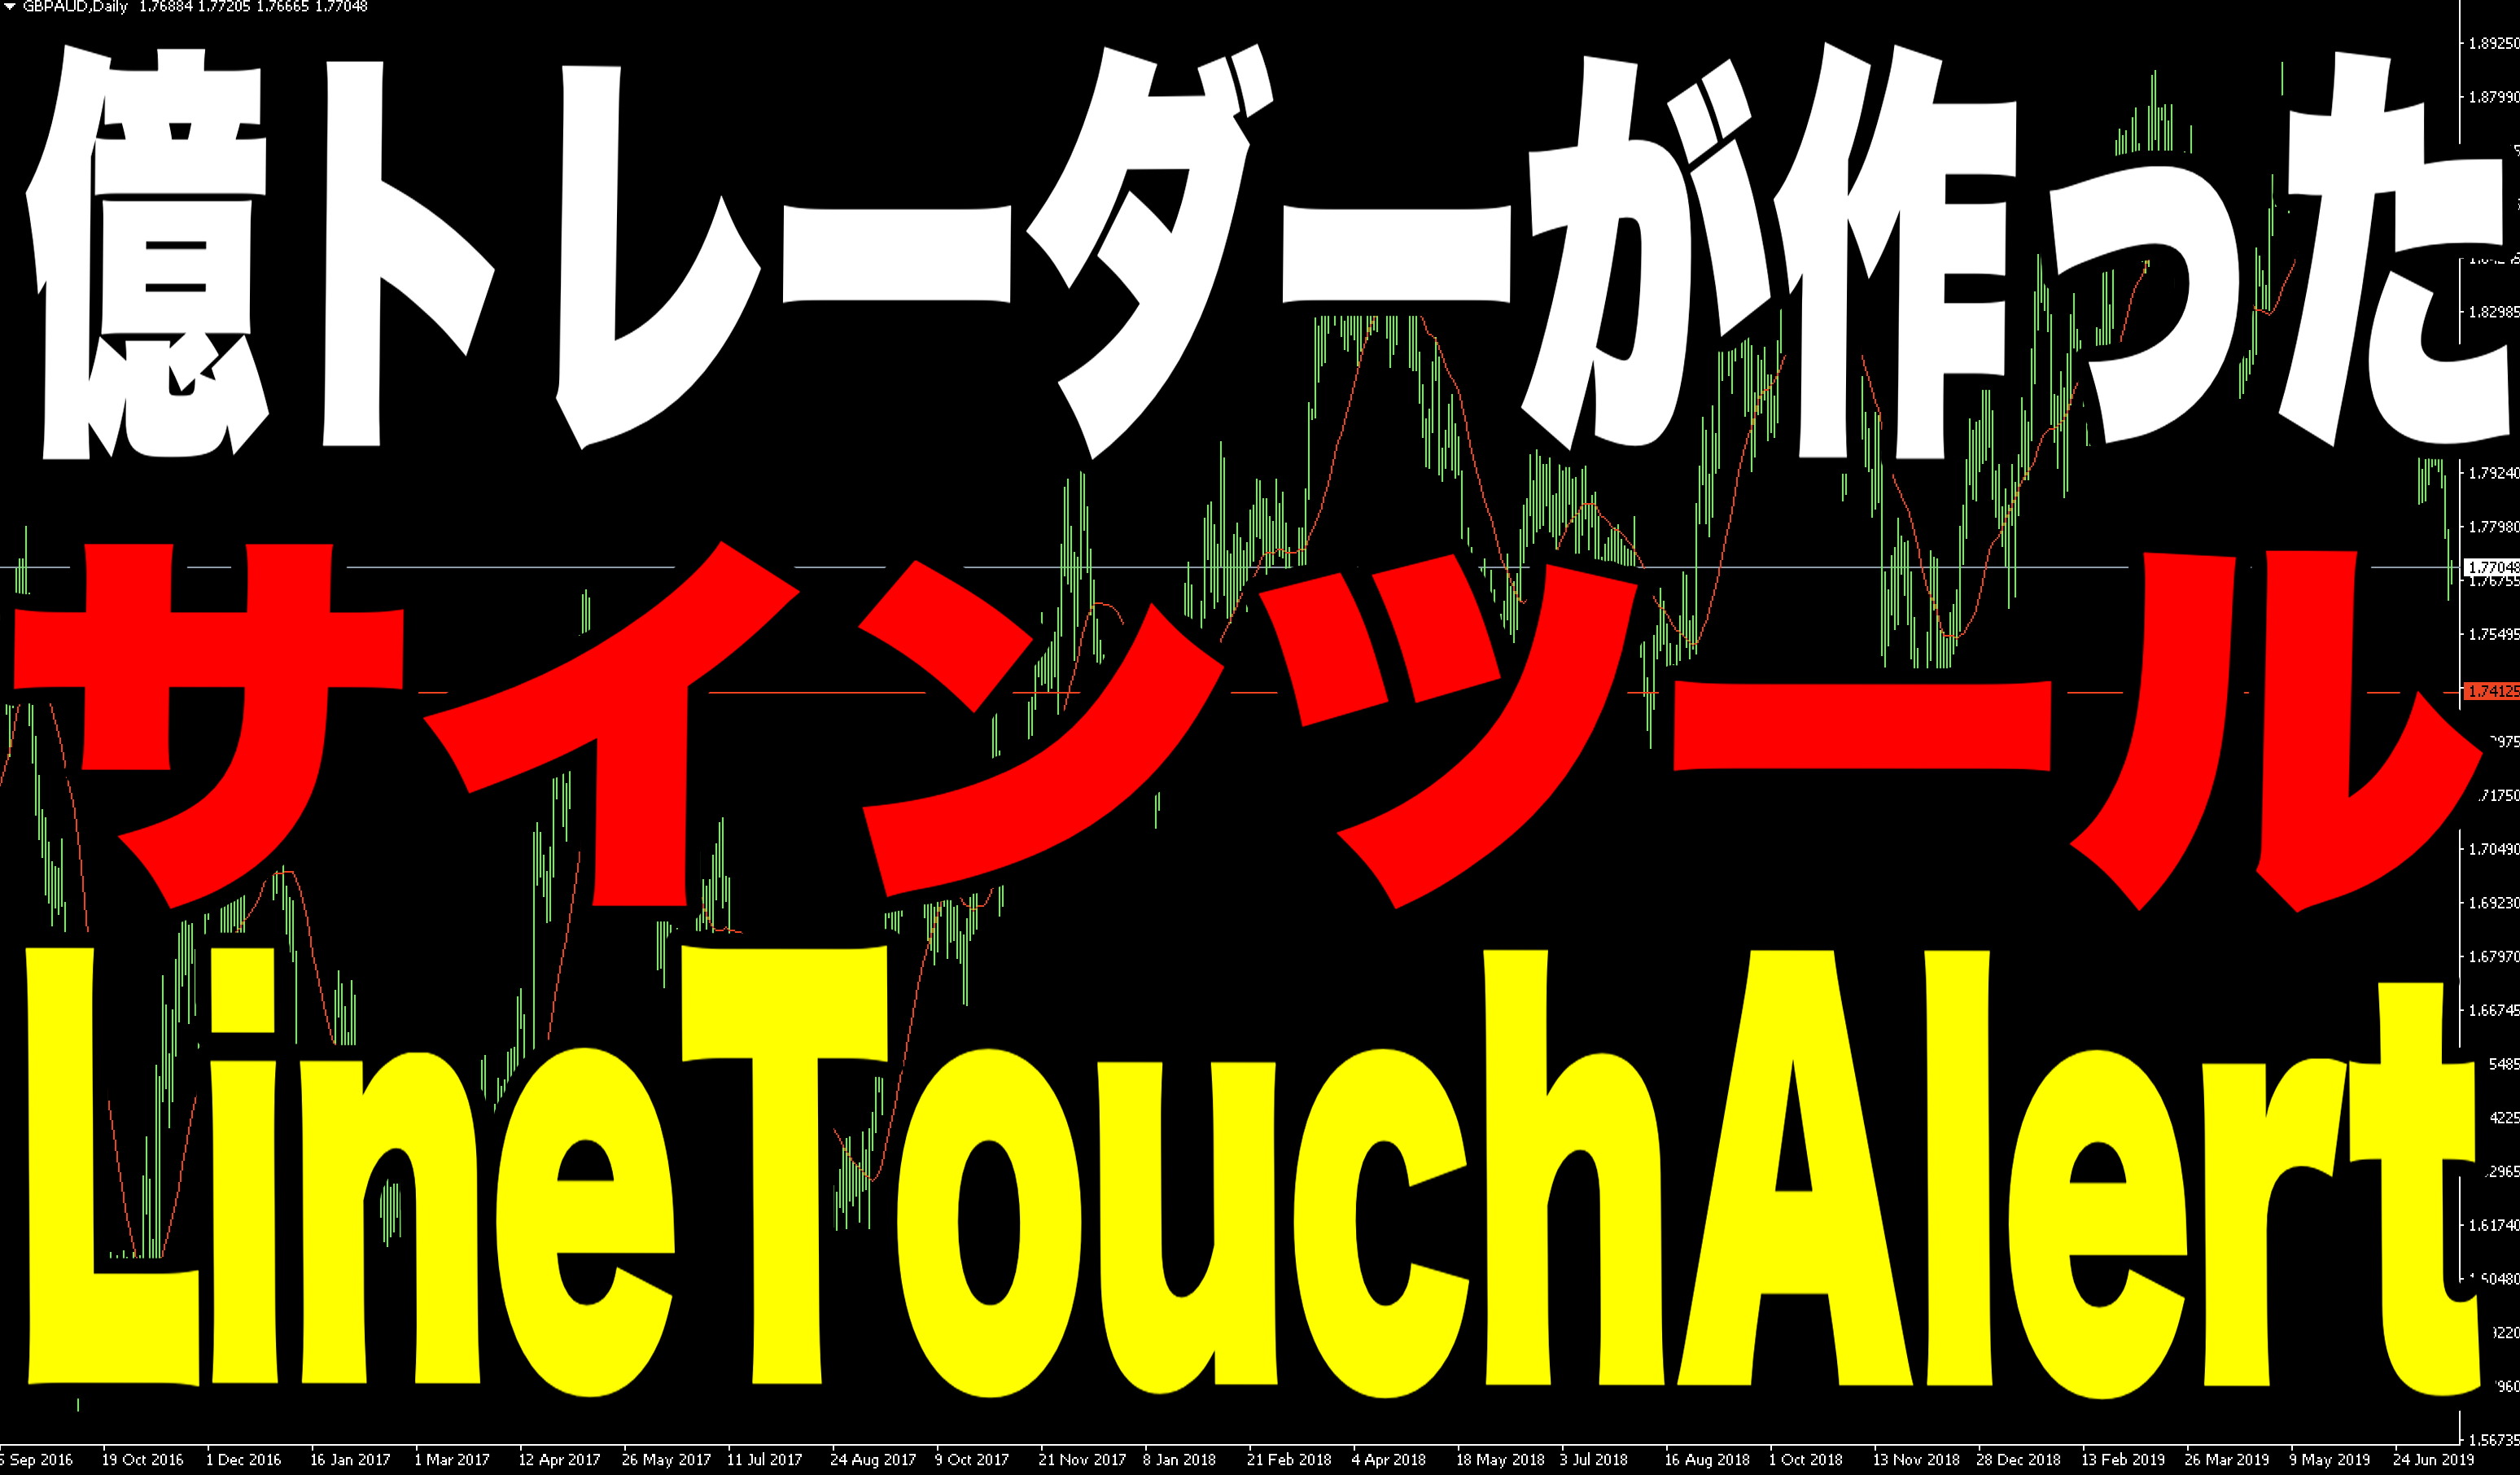 【LineTouchAlert(ラインタッチアラート)】とは!?億トレーダーがつくった無料サインツール